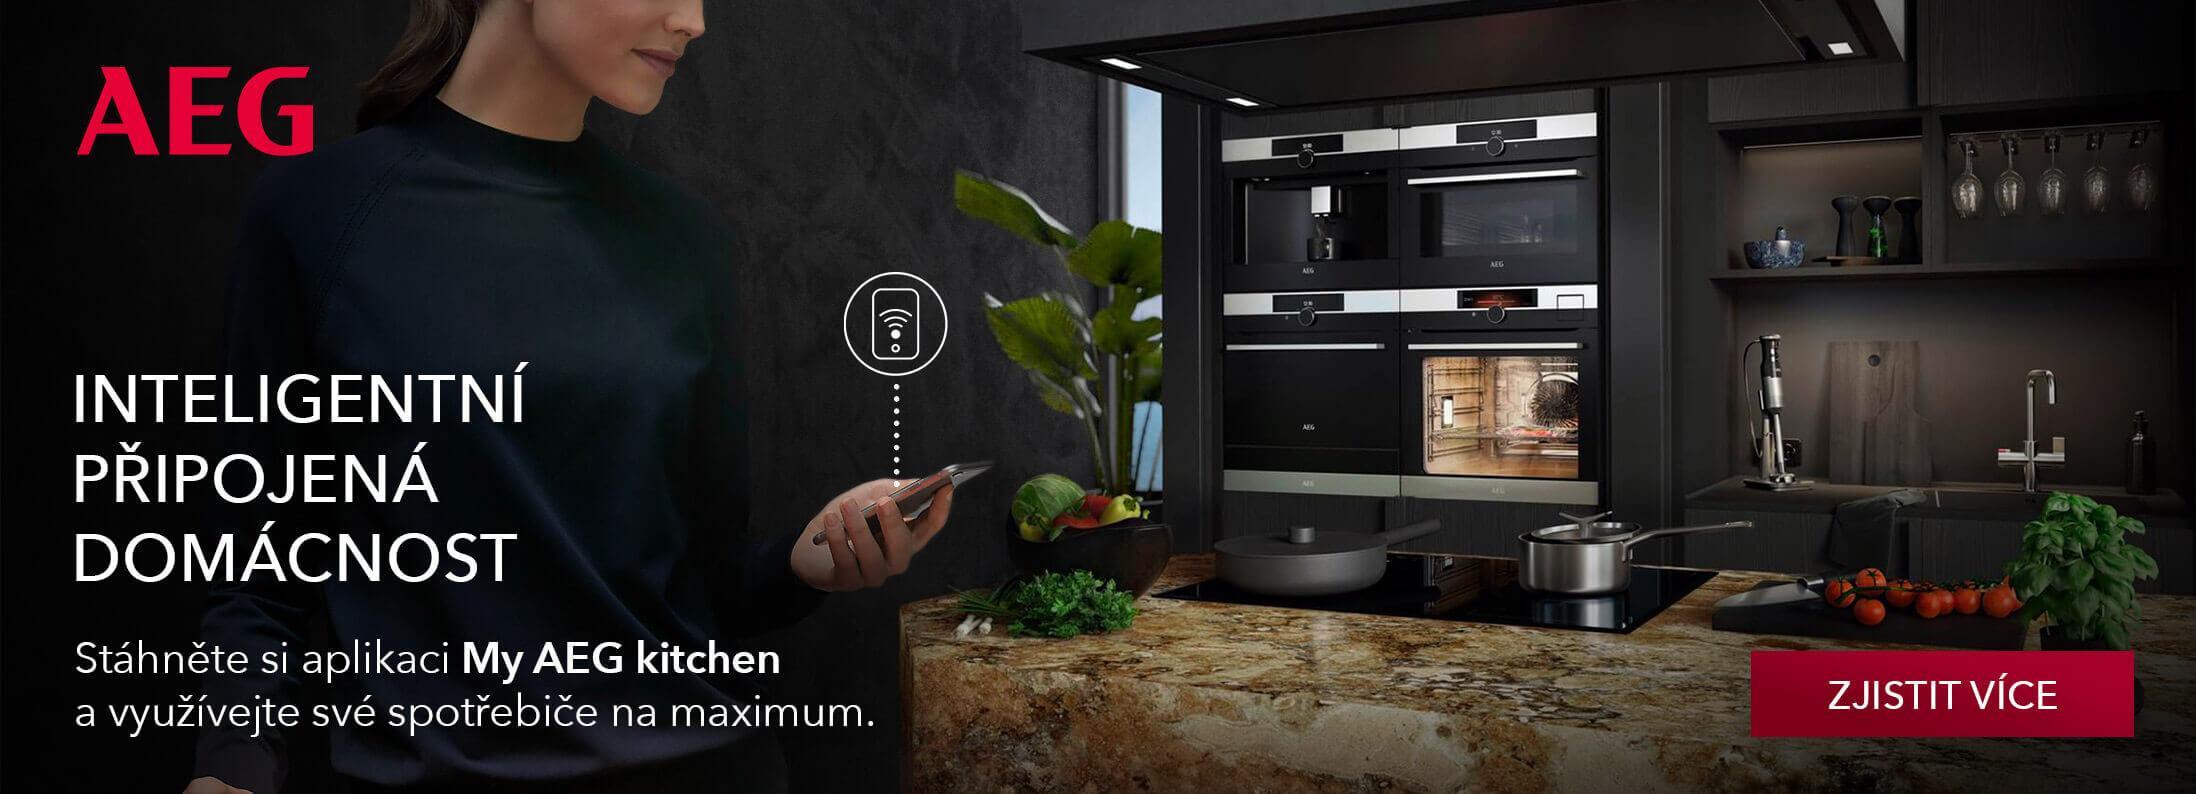 AEG - Aplikace My AEG Kitchen